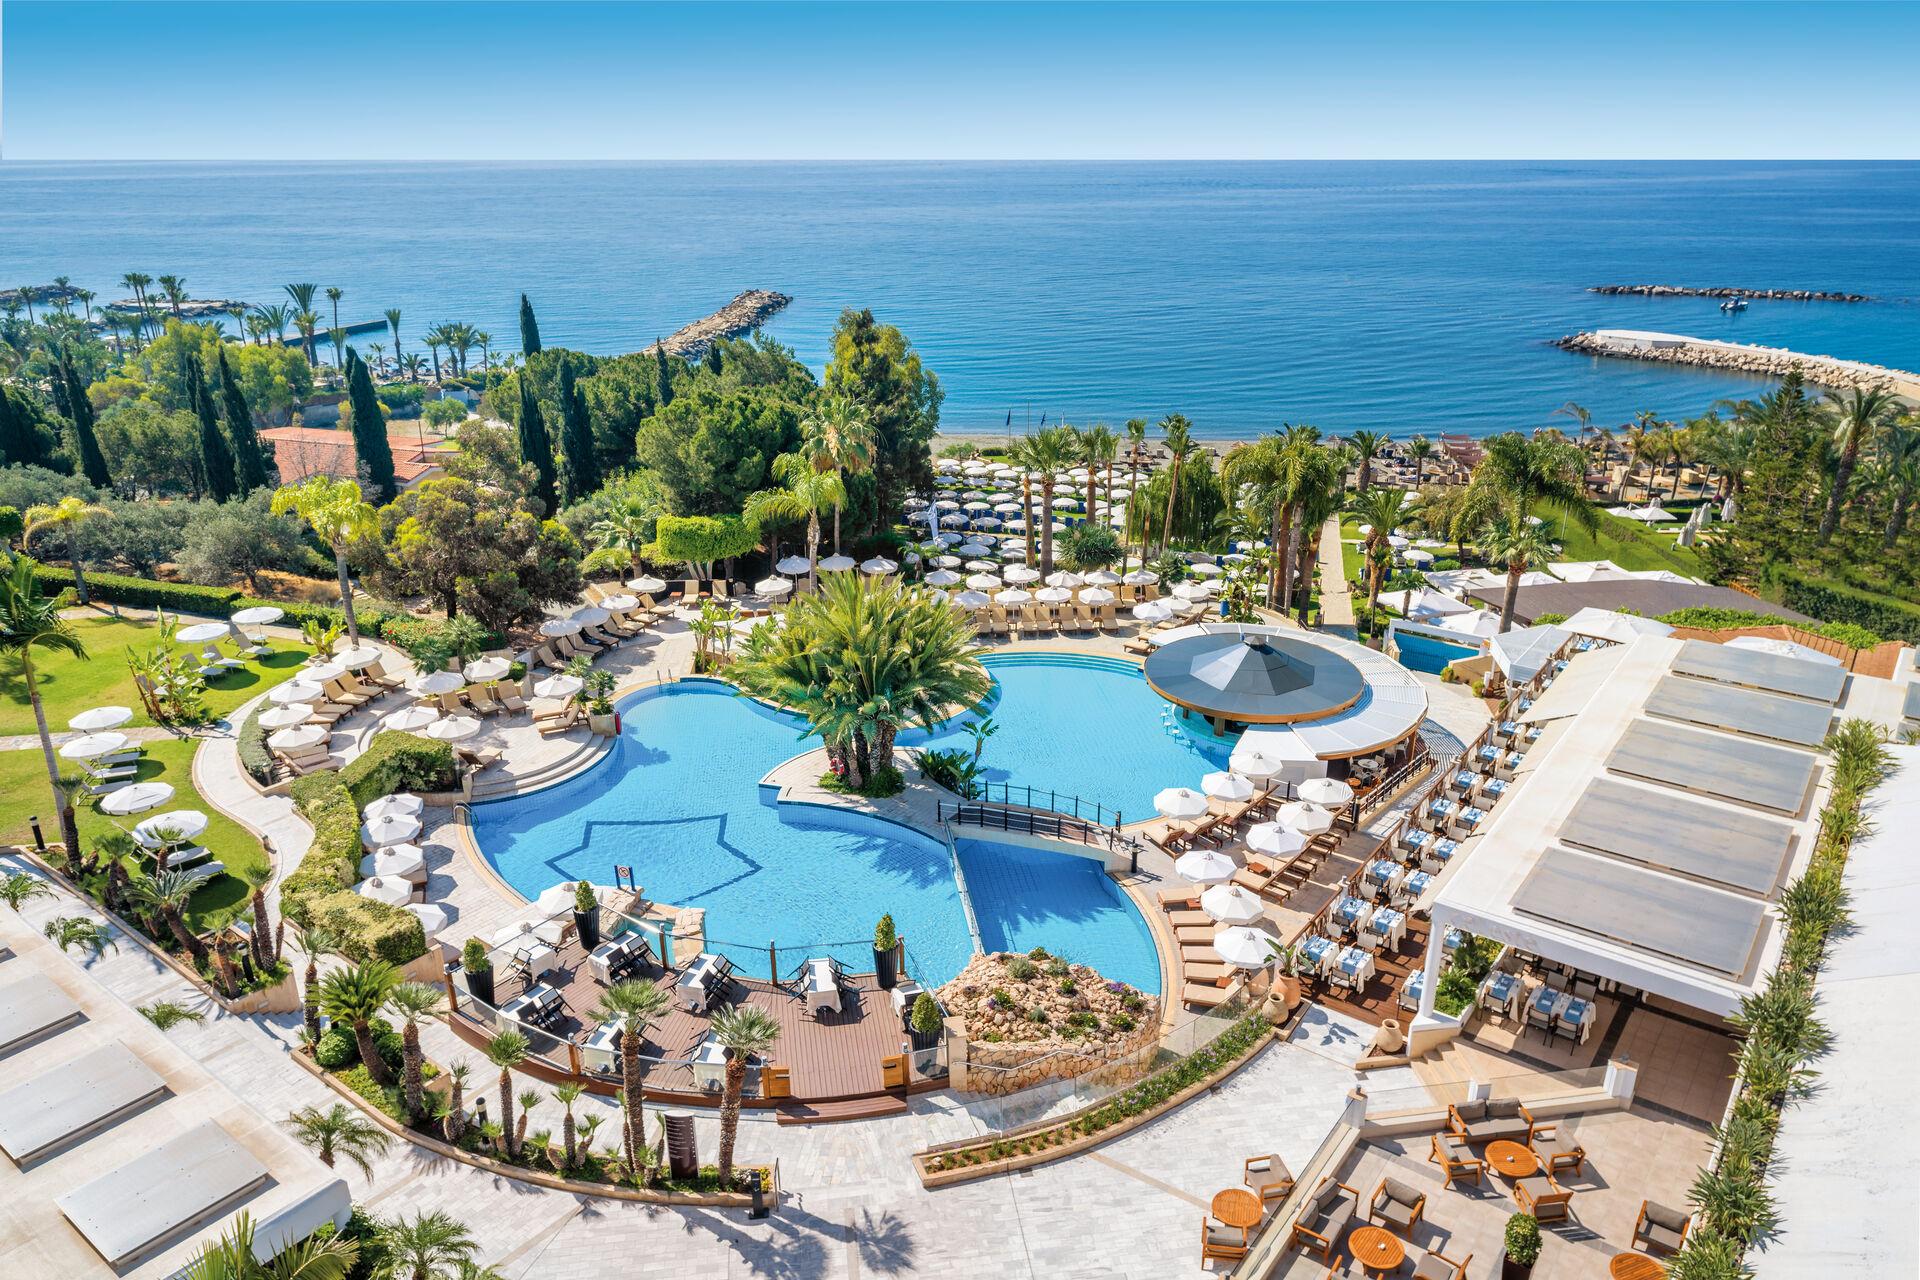 Mediterranean Beach - 4*